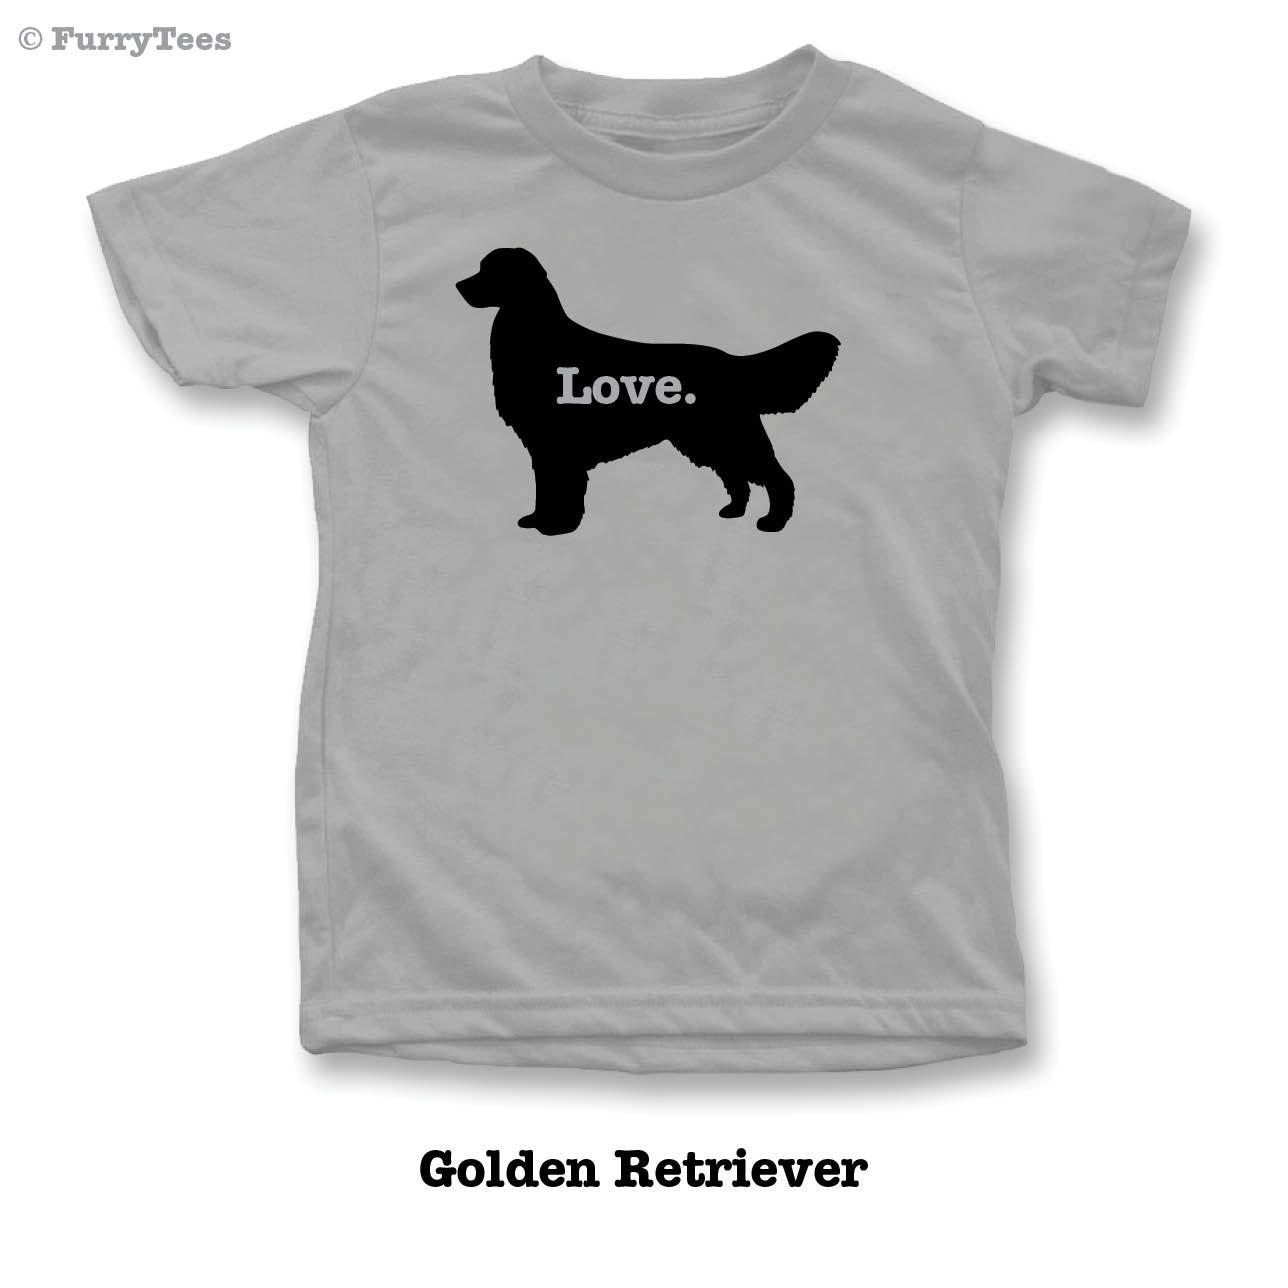 Dog lover tshirt, Golden Retriever New puppy, Dog Shirt, Dog Breed Gift, Dog Art, Pet Lover, Dog Mom by furrytees on Etsy